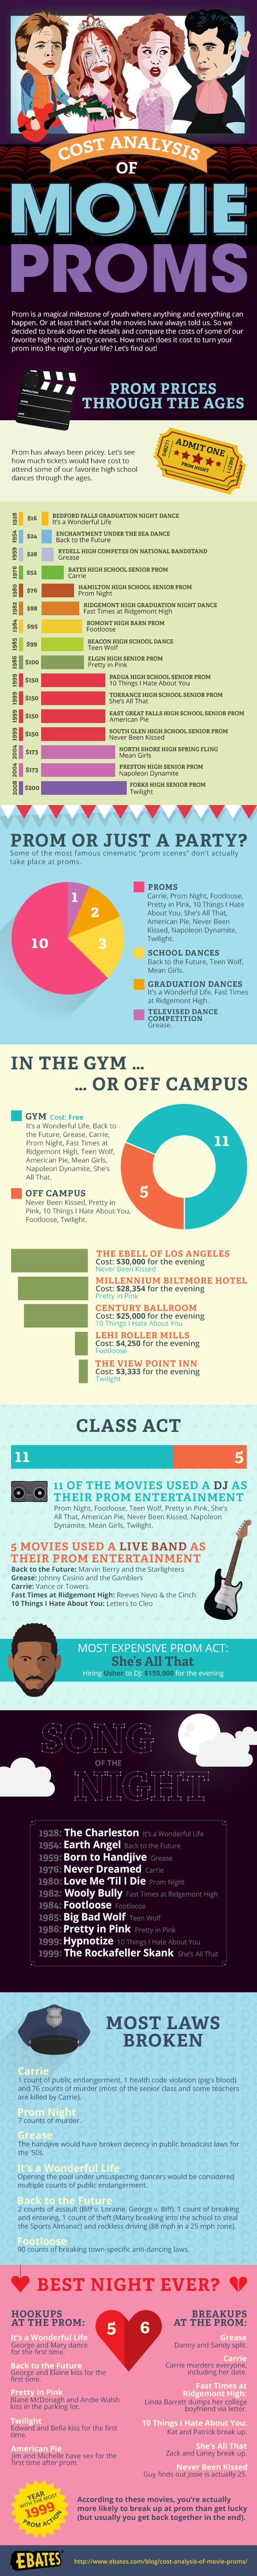 Cost Analysis of Movie Proms - Ebates